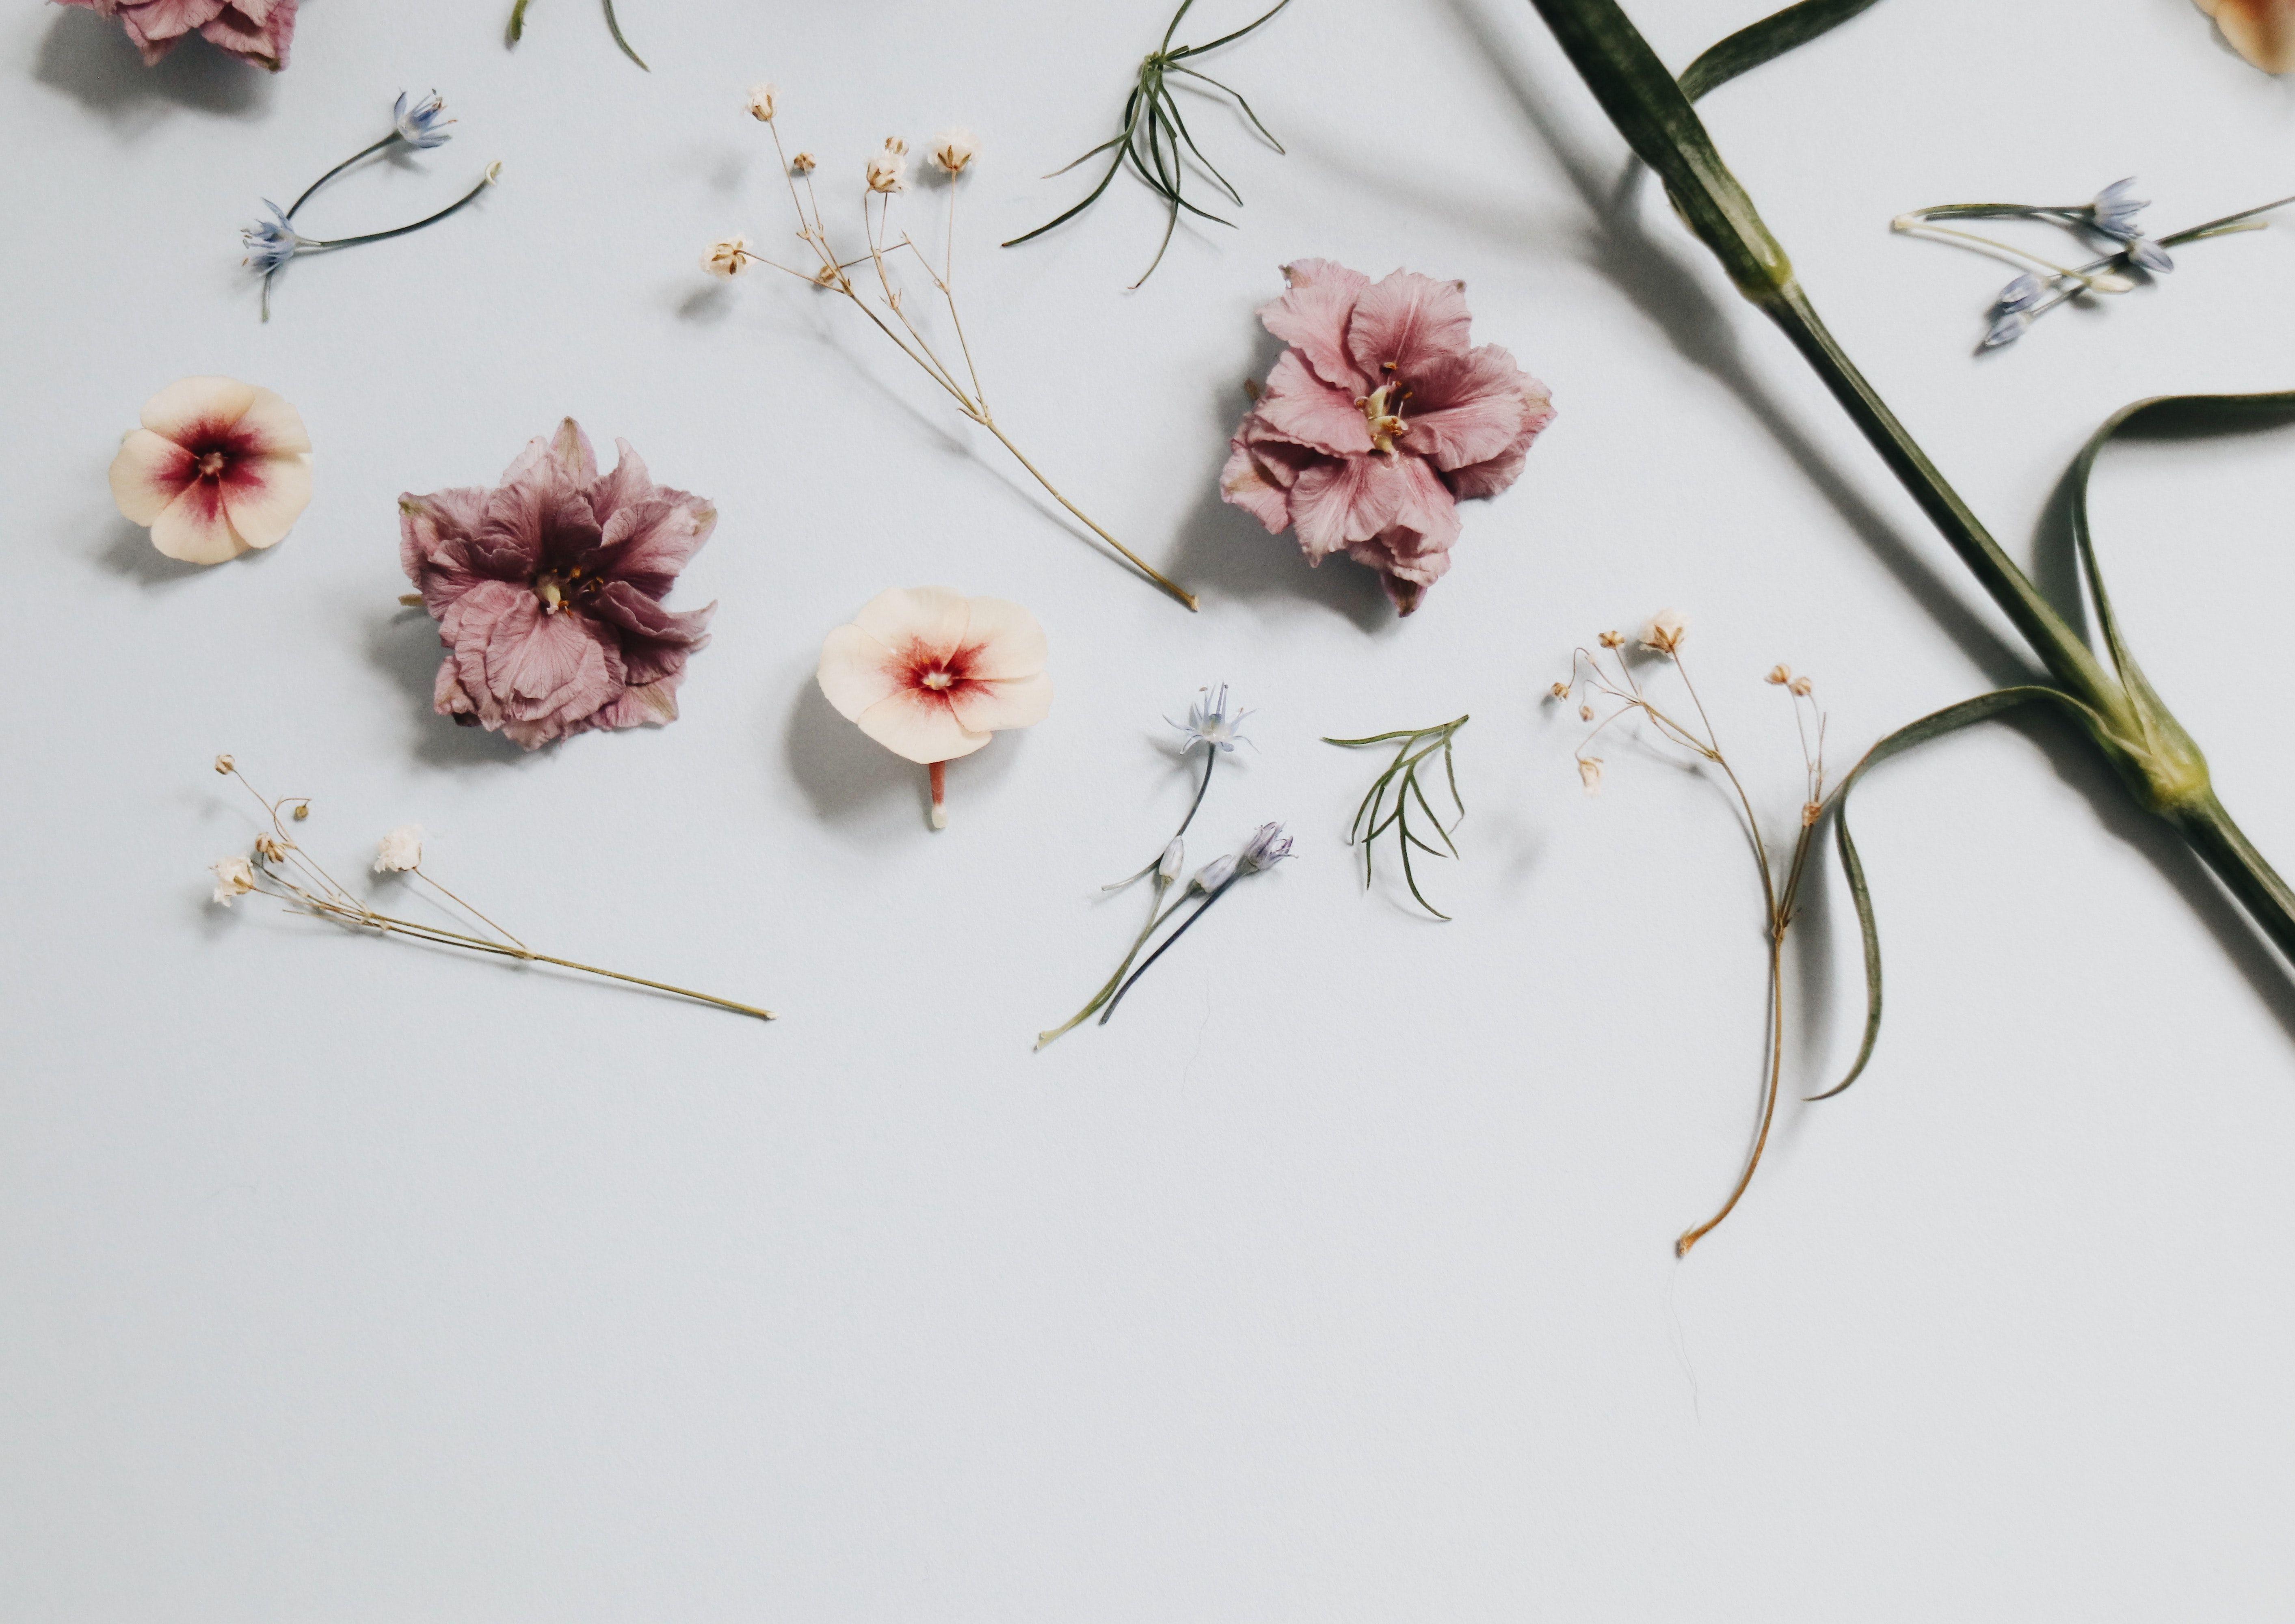 Minimalist Floral Laptop Wallpapers Wallpaper Cave